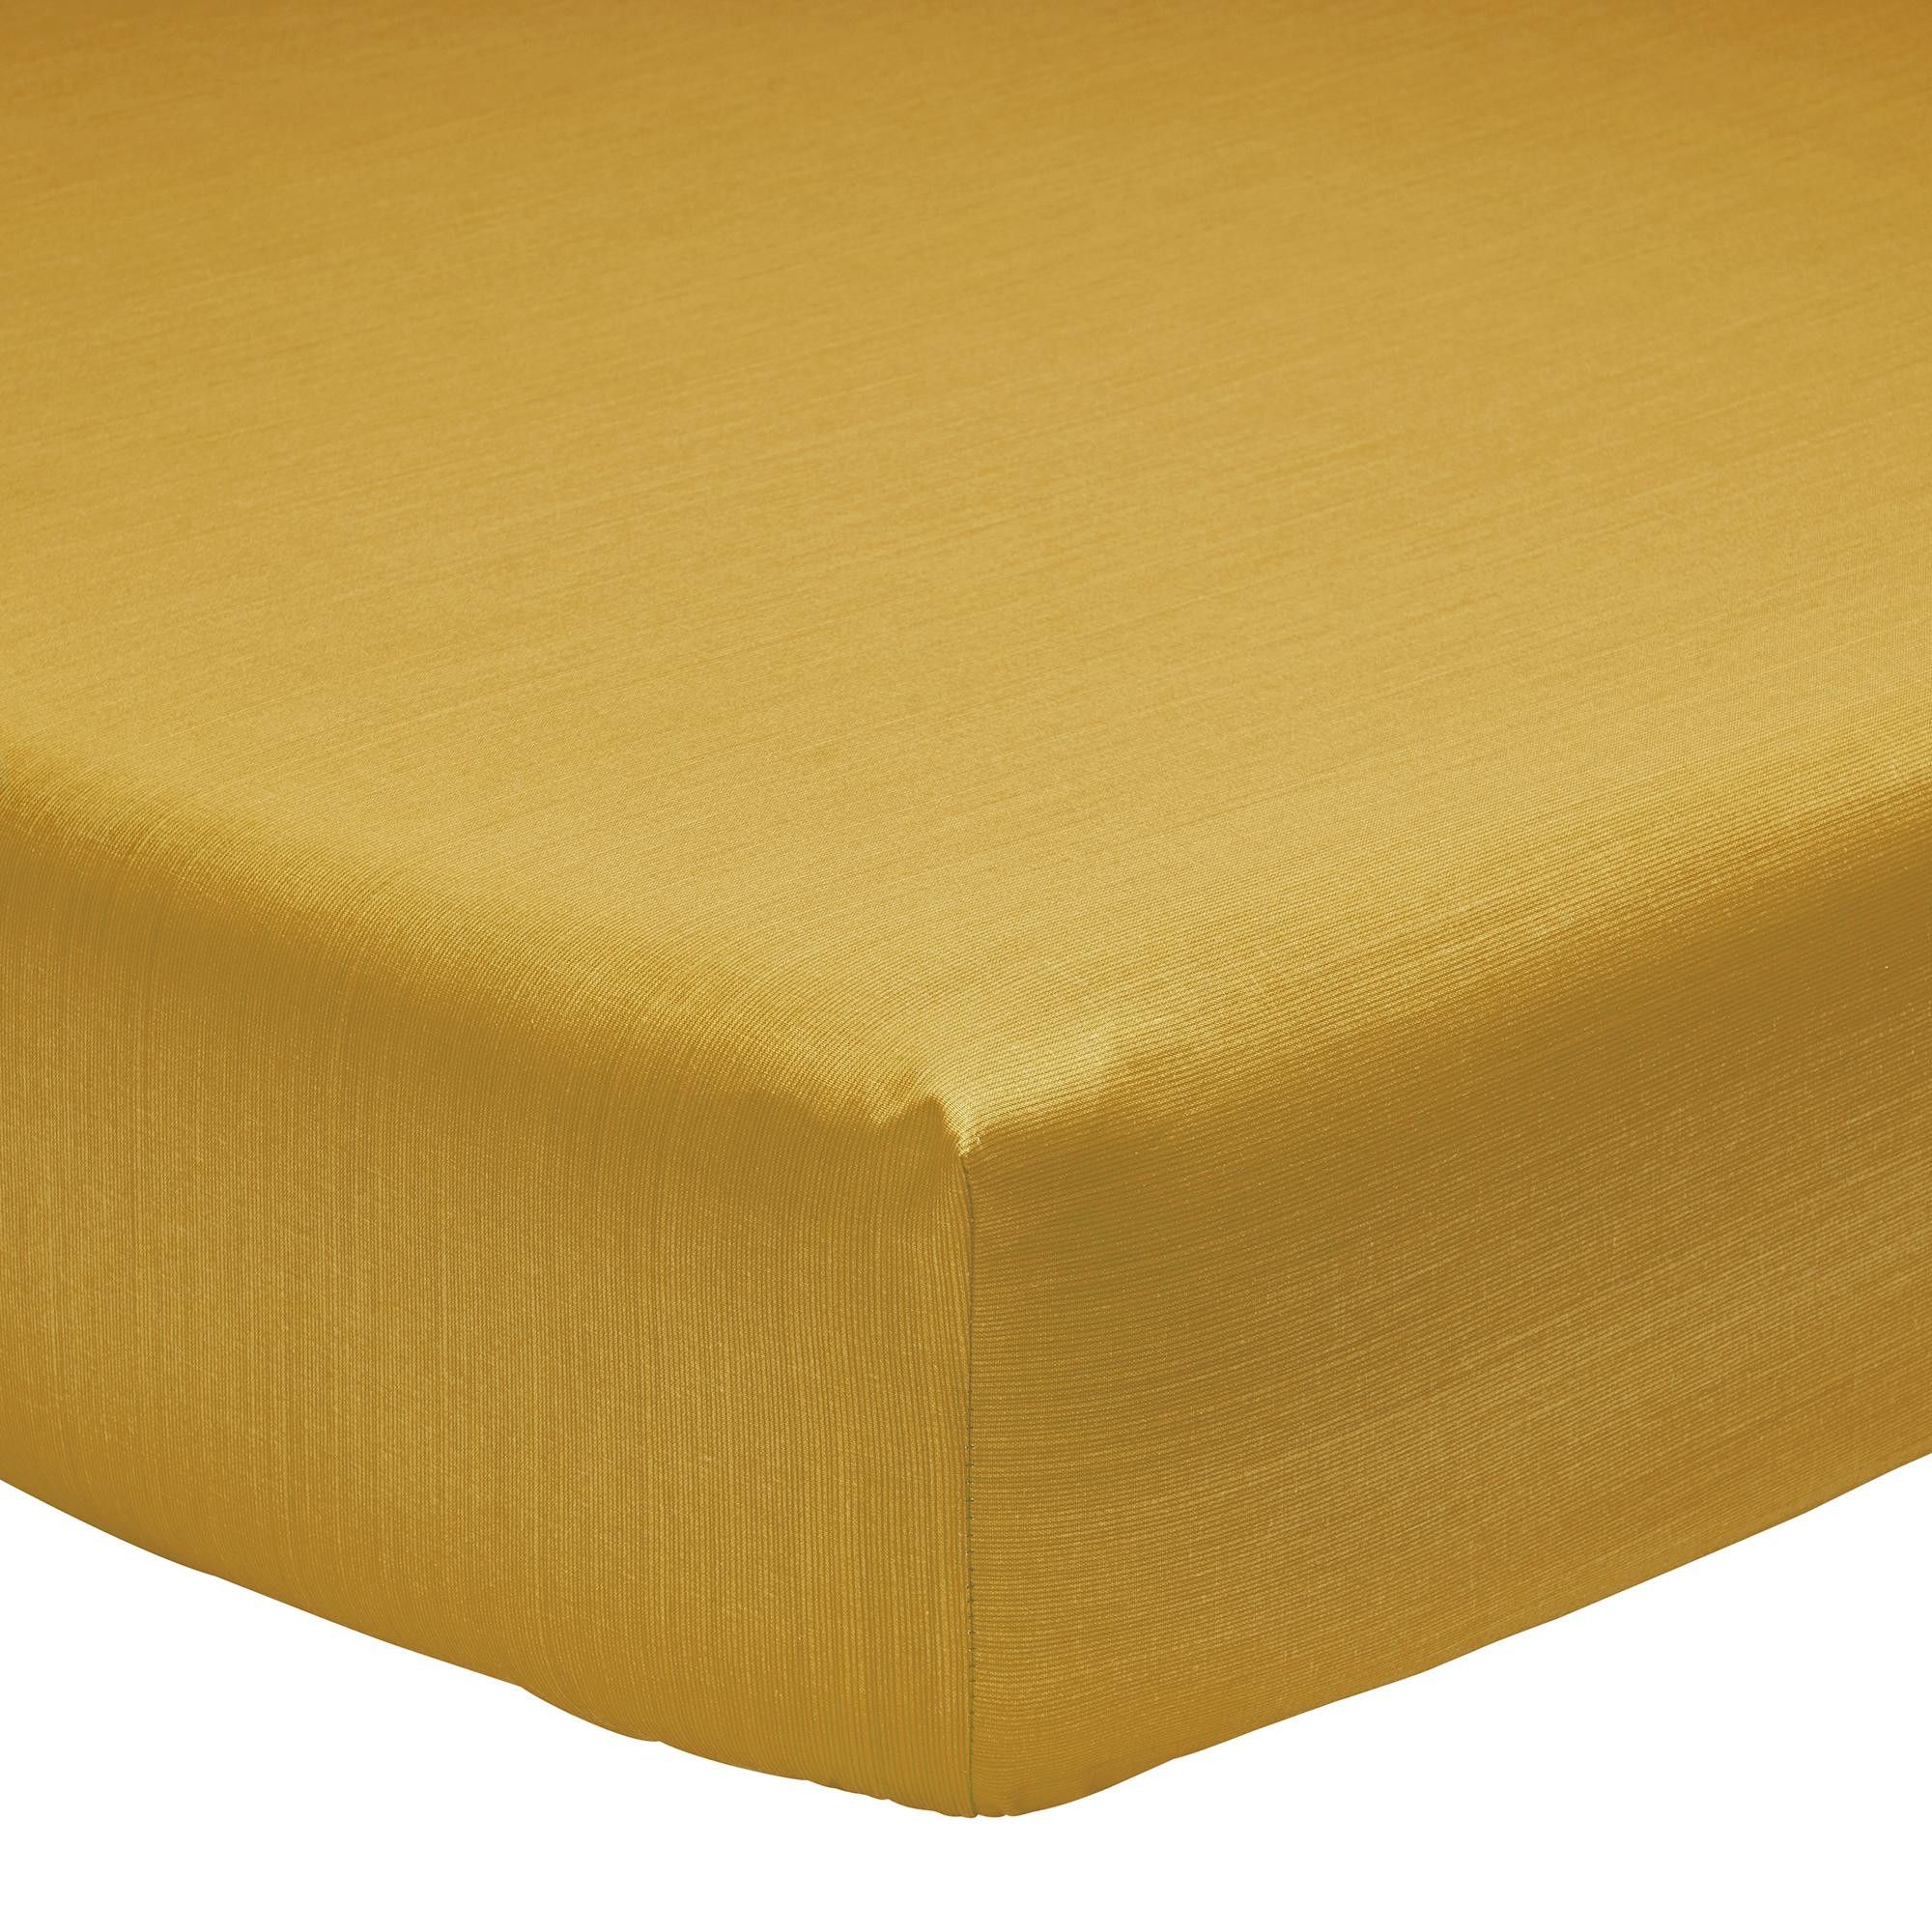 Drap housse fines rayures en bambou jaune 160 x 200